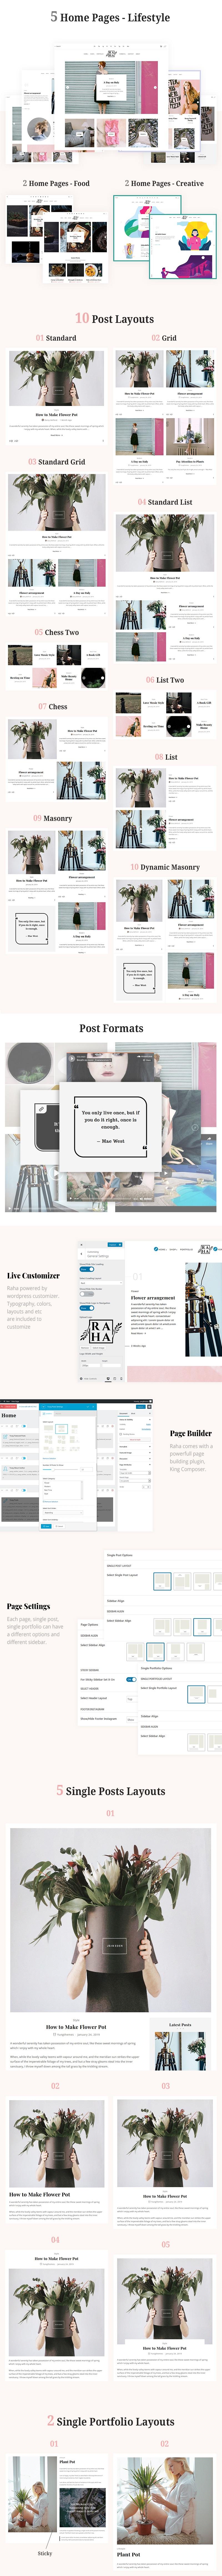 Raha - Creative WordPress Theme - 2